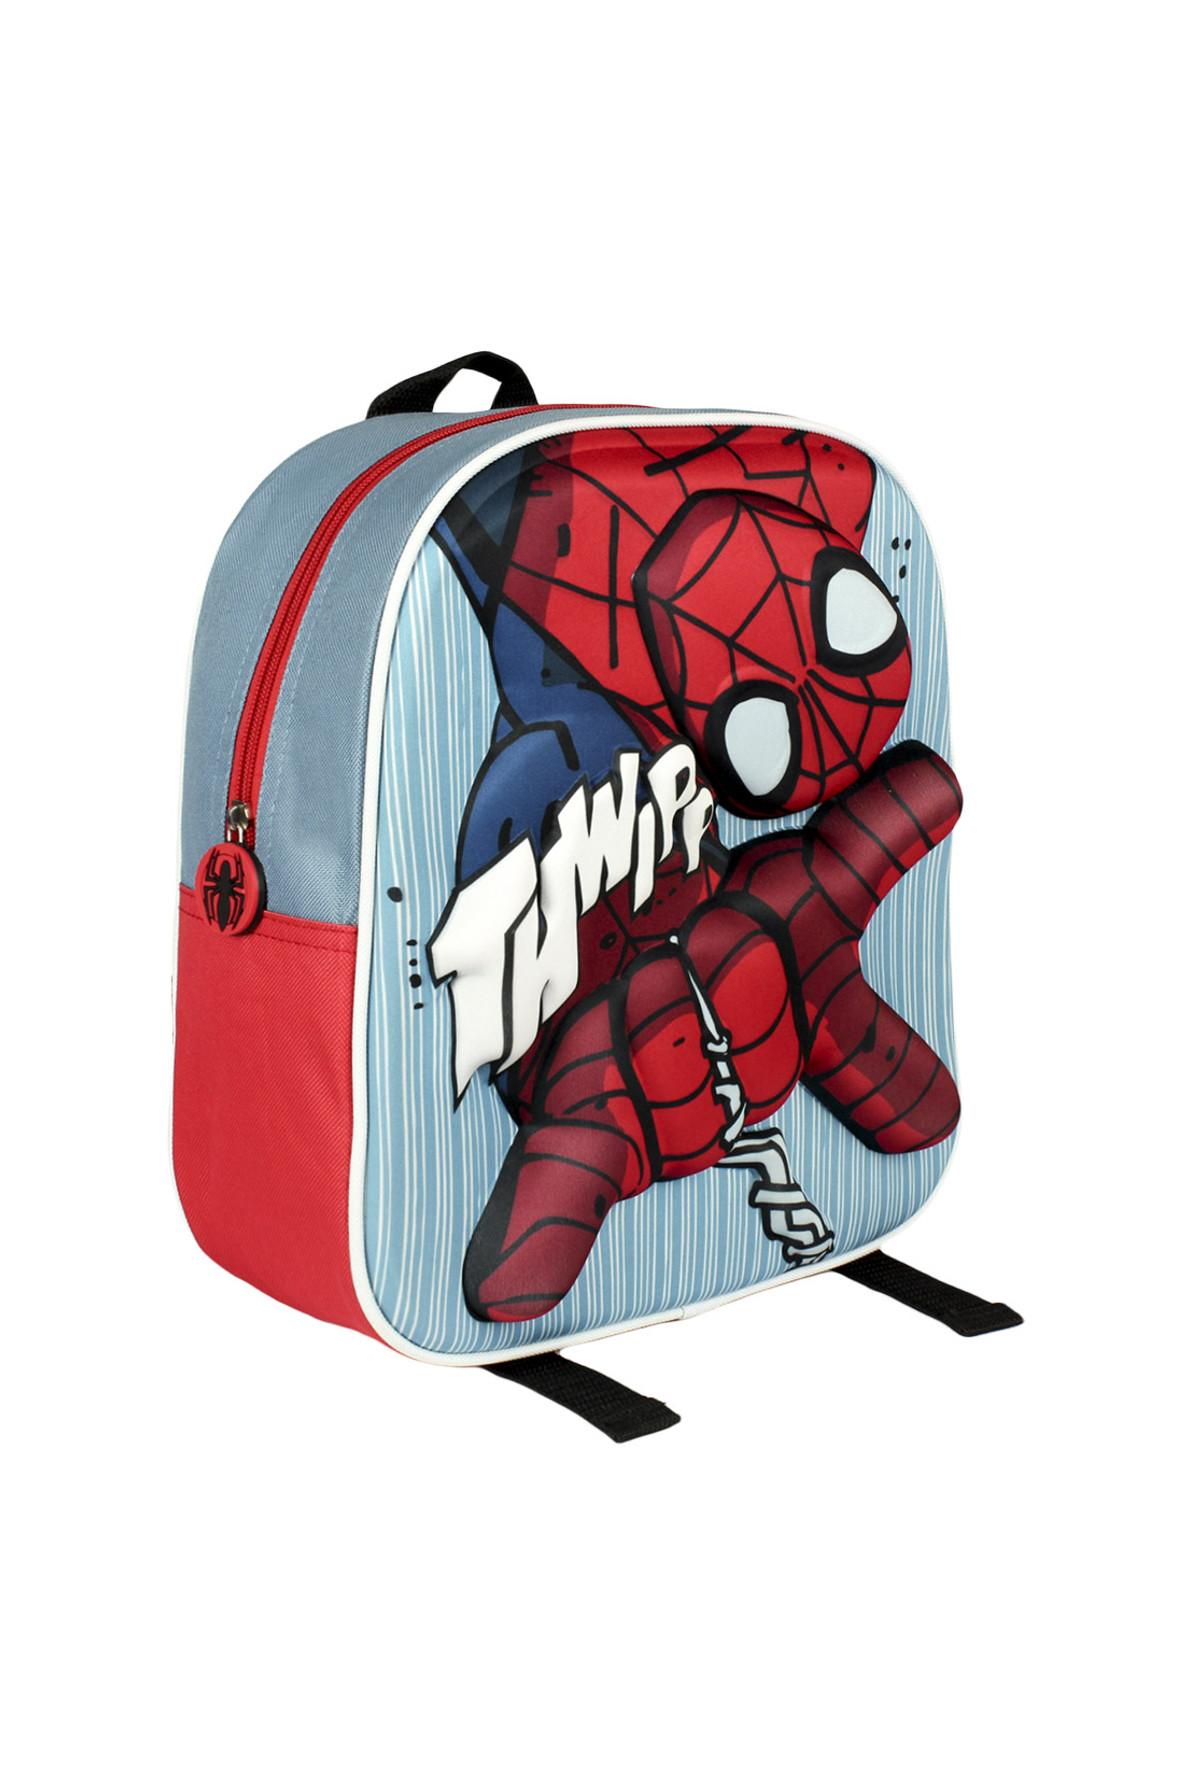 c999330c41ad1 Plecak Spiderman 1Y32B7